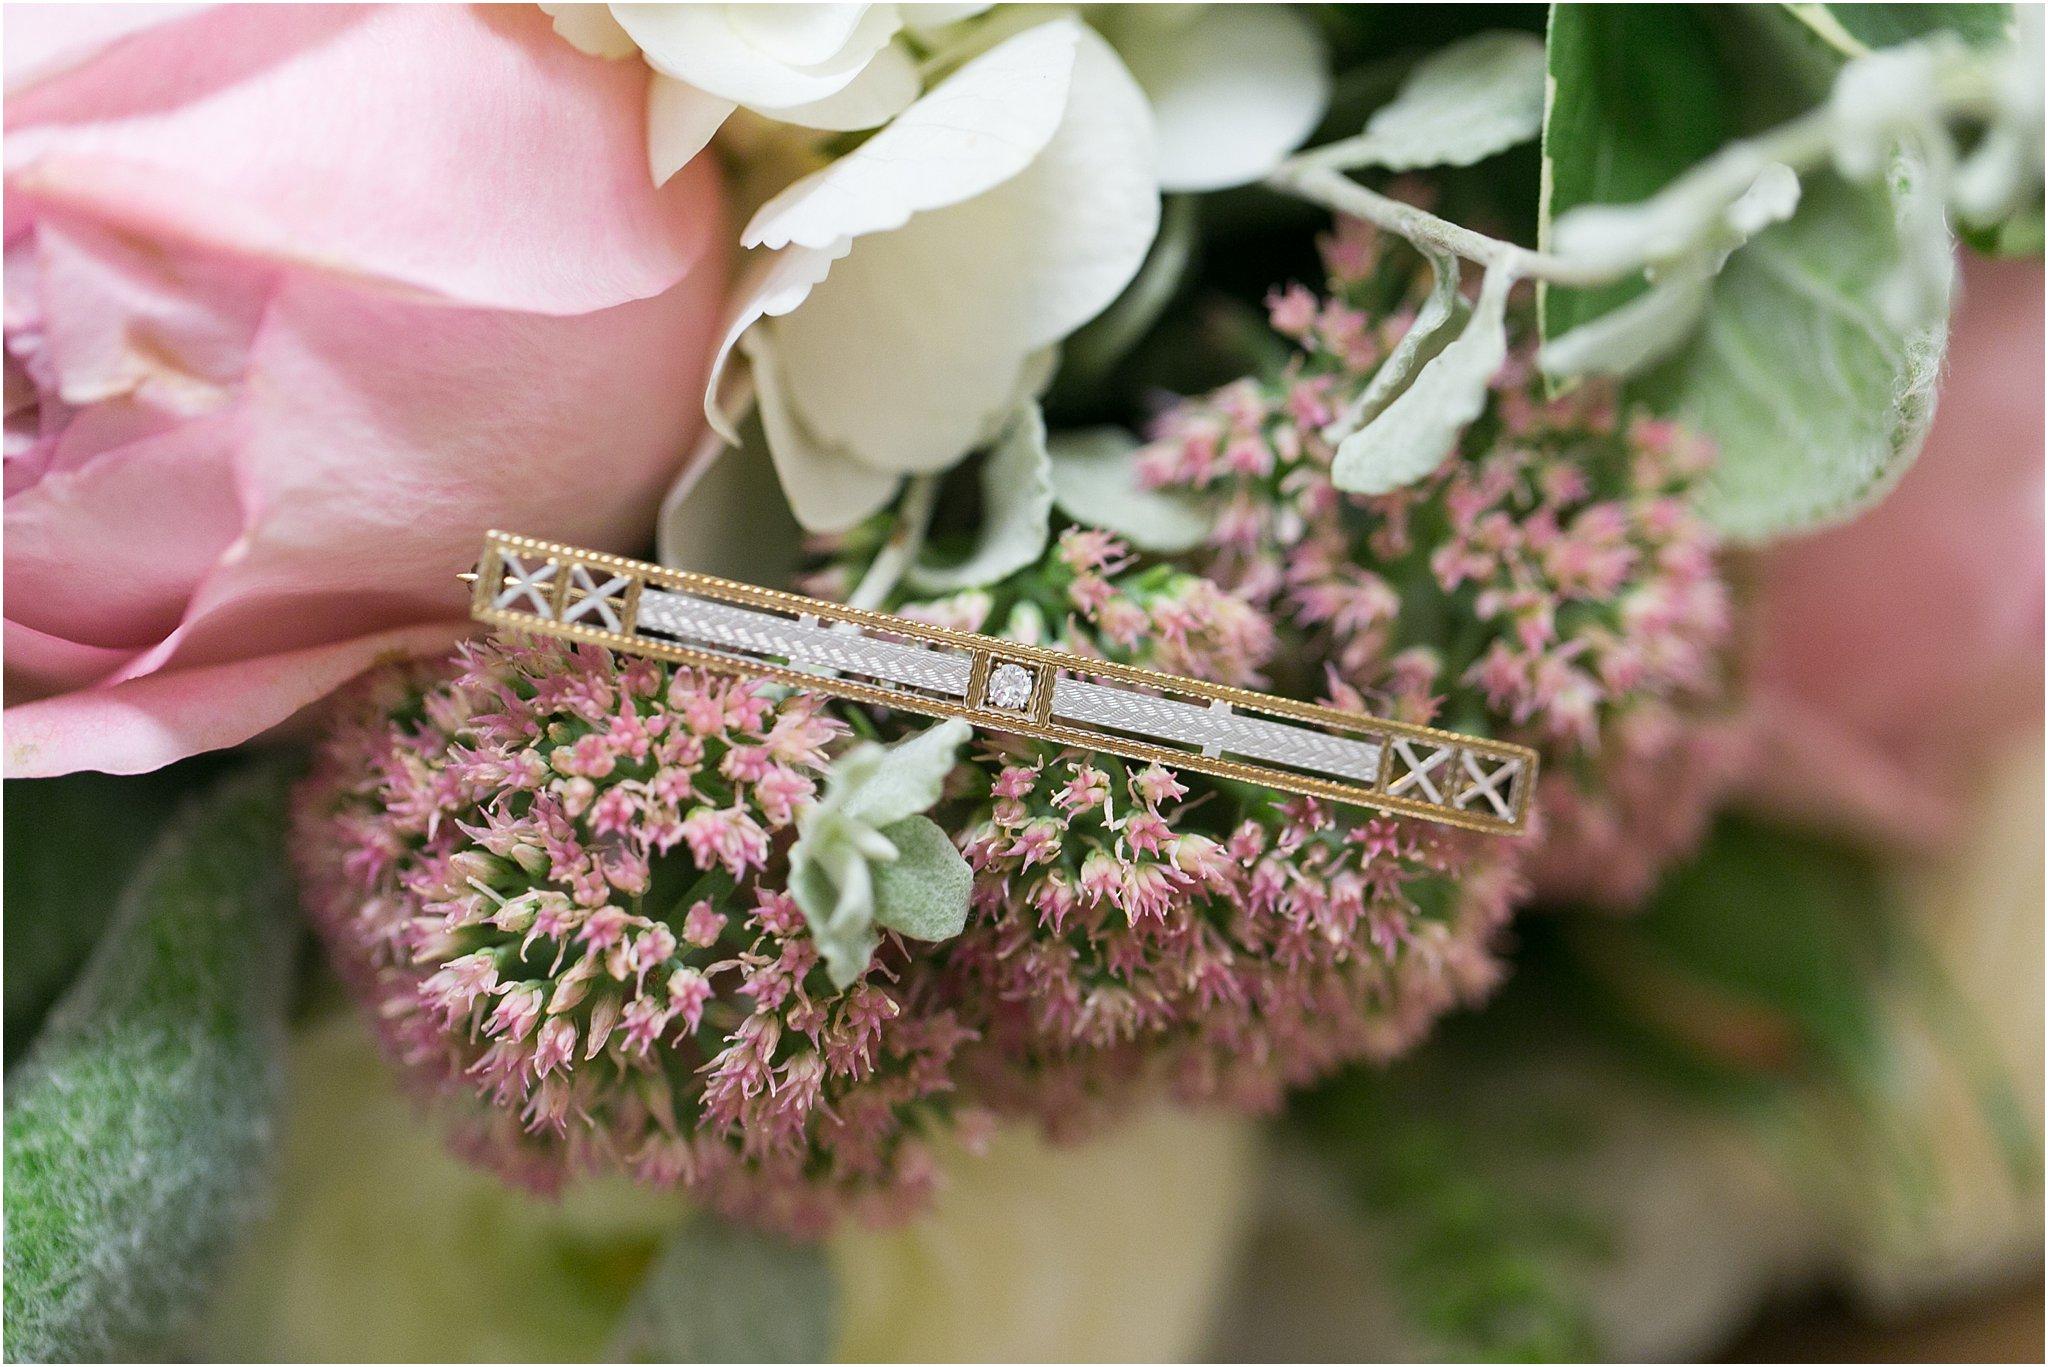 jessica_ryan_photography_virginia_wedding_photographer_wedding_hurricane_norfolk_botanical_gardens_hurricane_matthew_wedding_3546